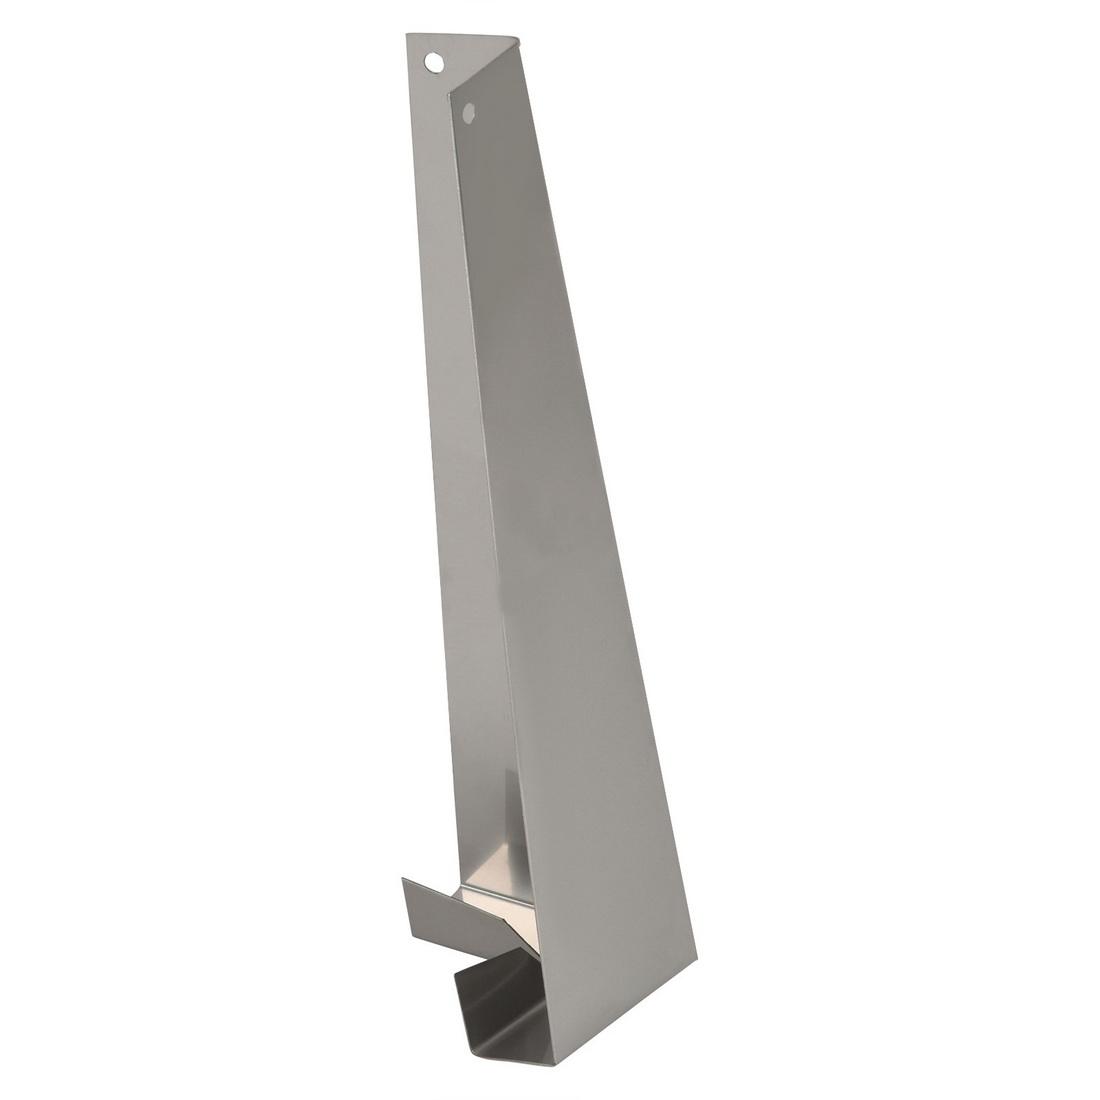 Linea Weatherboard 180mm Stainless Steel External Corner Soaker 90 Degree